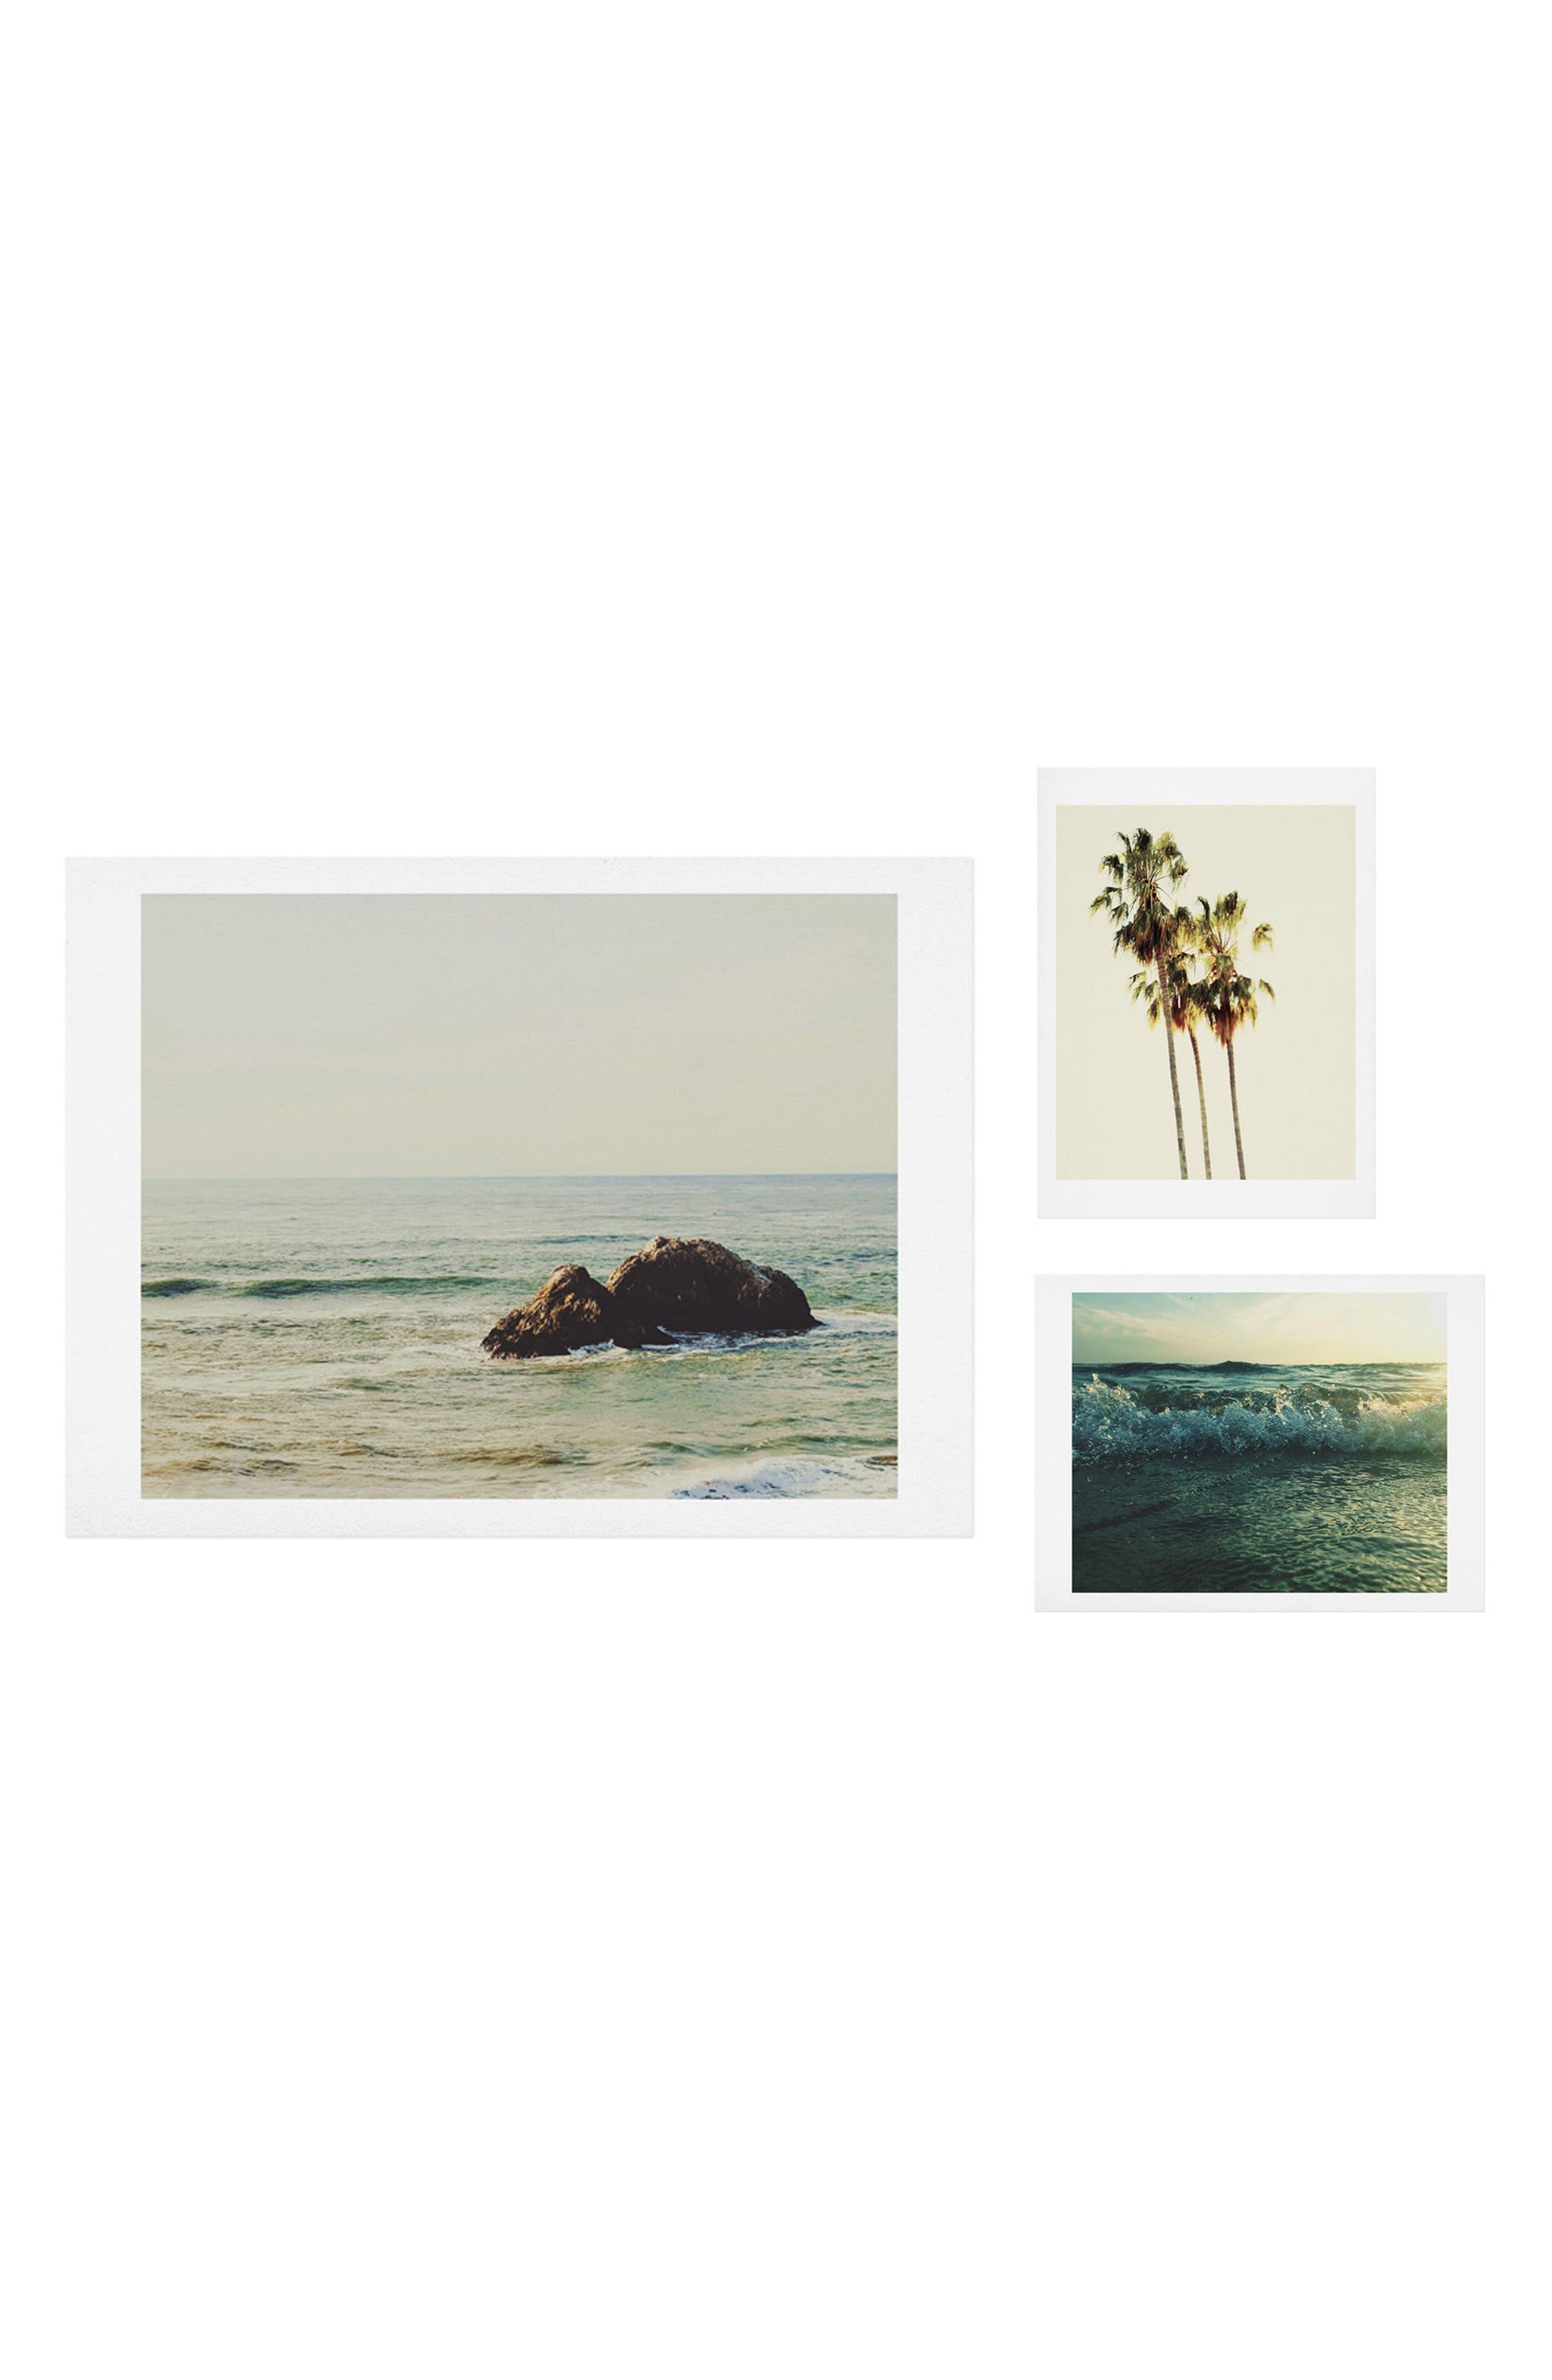 Ocean Calling 3-Piece Gallery Wall Art Print Set,                             Main thumbnail 1, color,                             GREEN/ BLUE